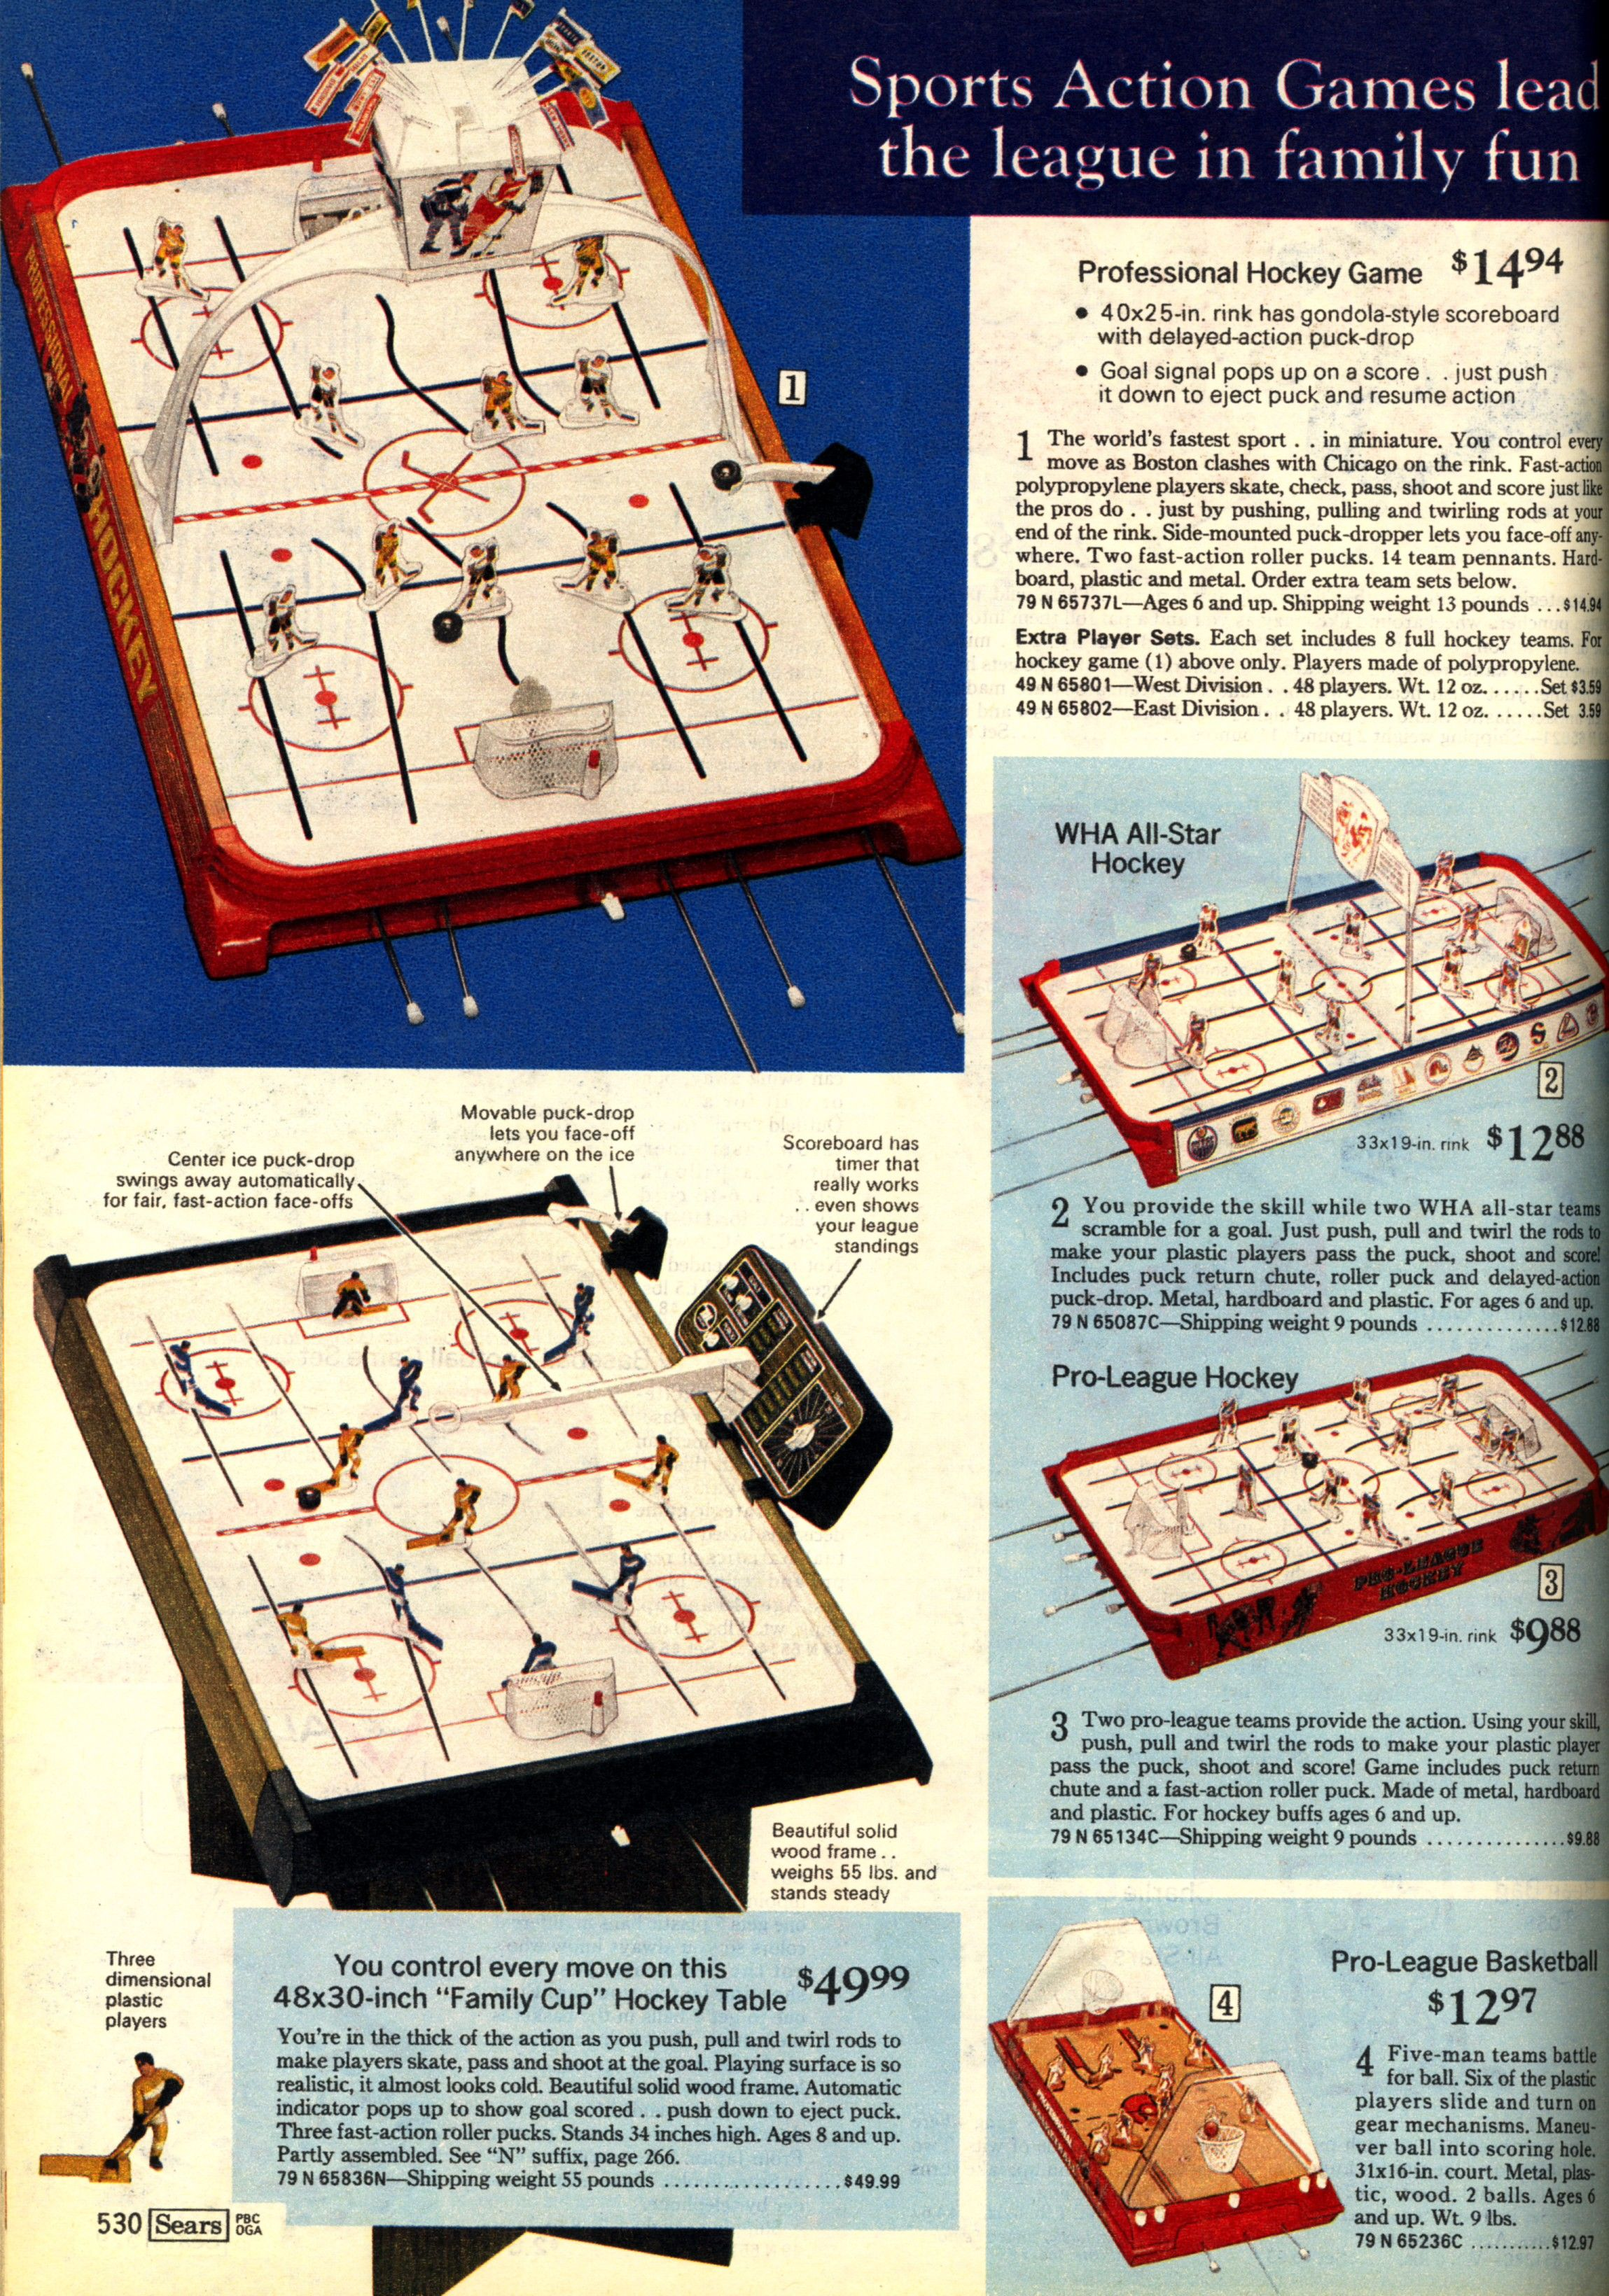 1974 Sears Christmas Wish Book Munro Games Table Hockey And